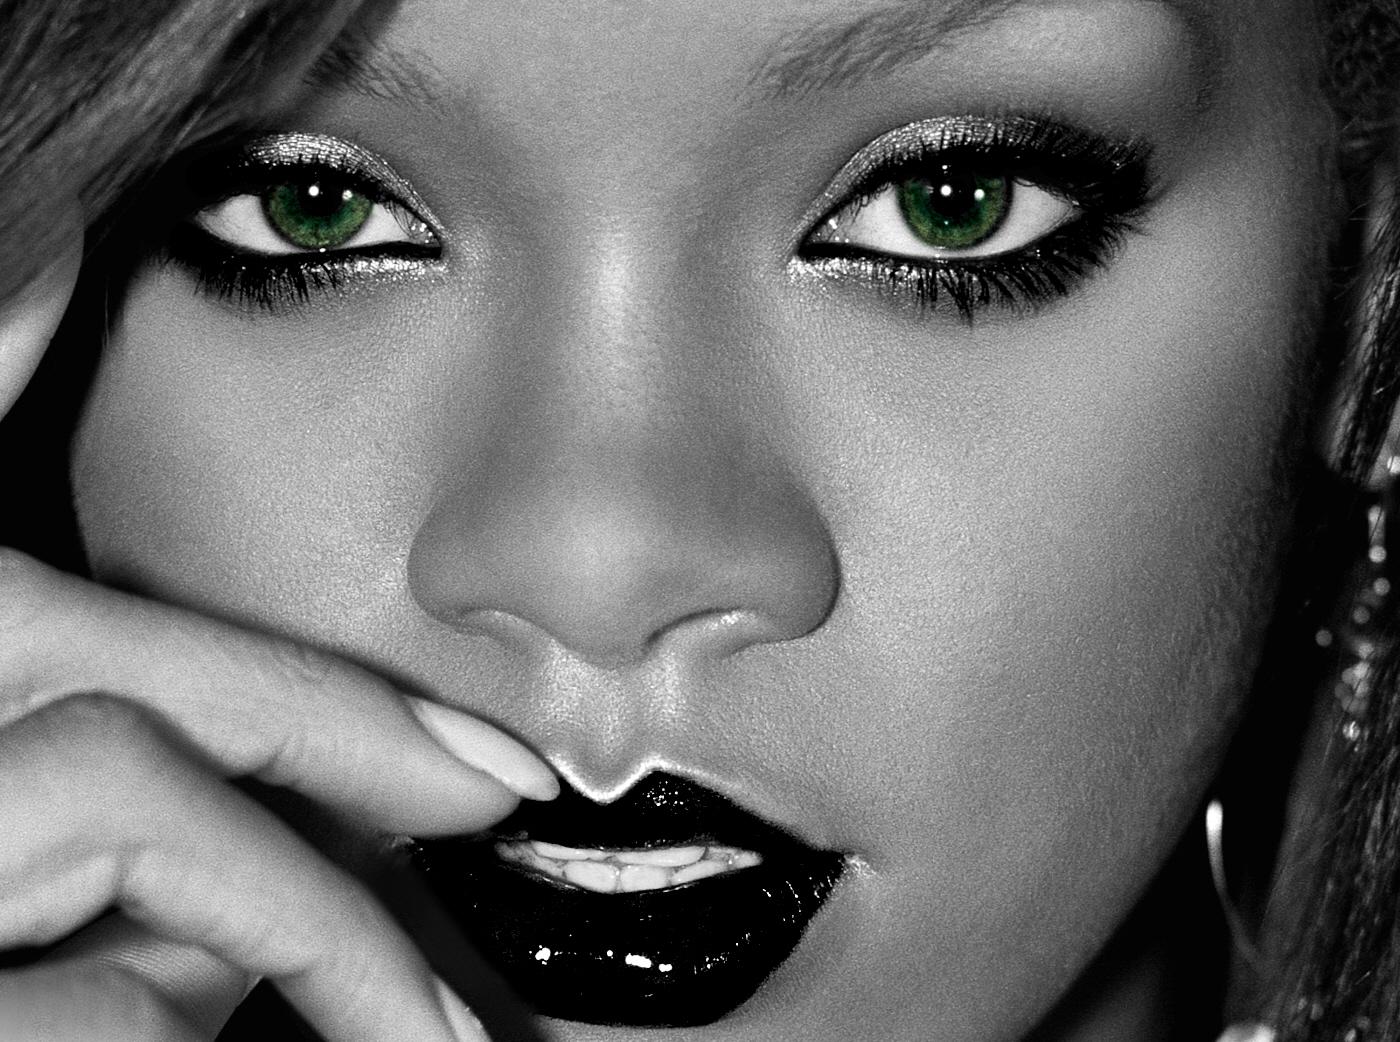 http://2.bp.blogspot.com/-rFTe2xVIXDc/UDTH2GRw-pI/AAAAAAAAM8o/KwG-VNr1Bw4/s1600/Rihanna-Wallpaper-2.jpg